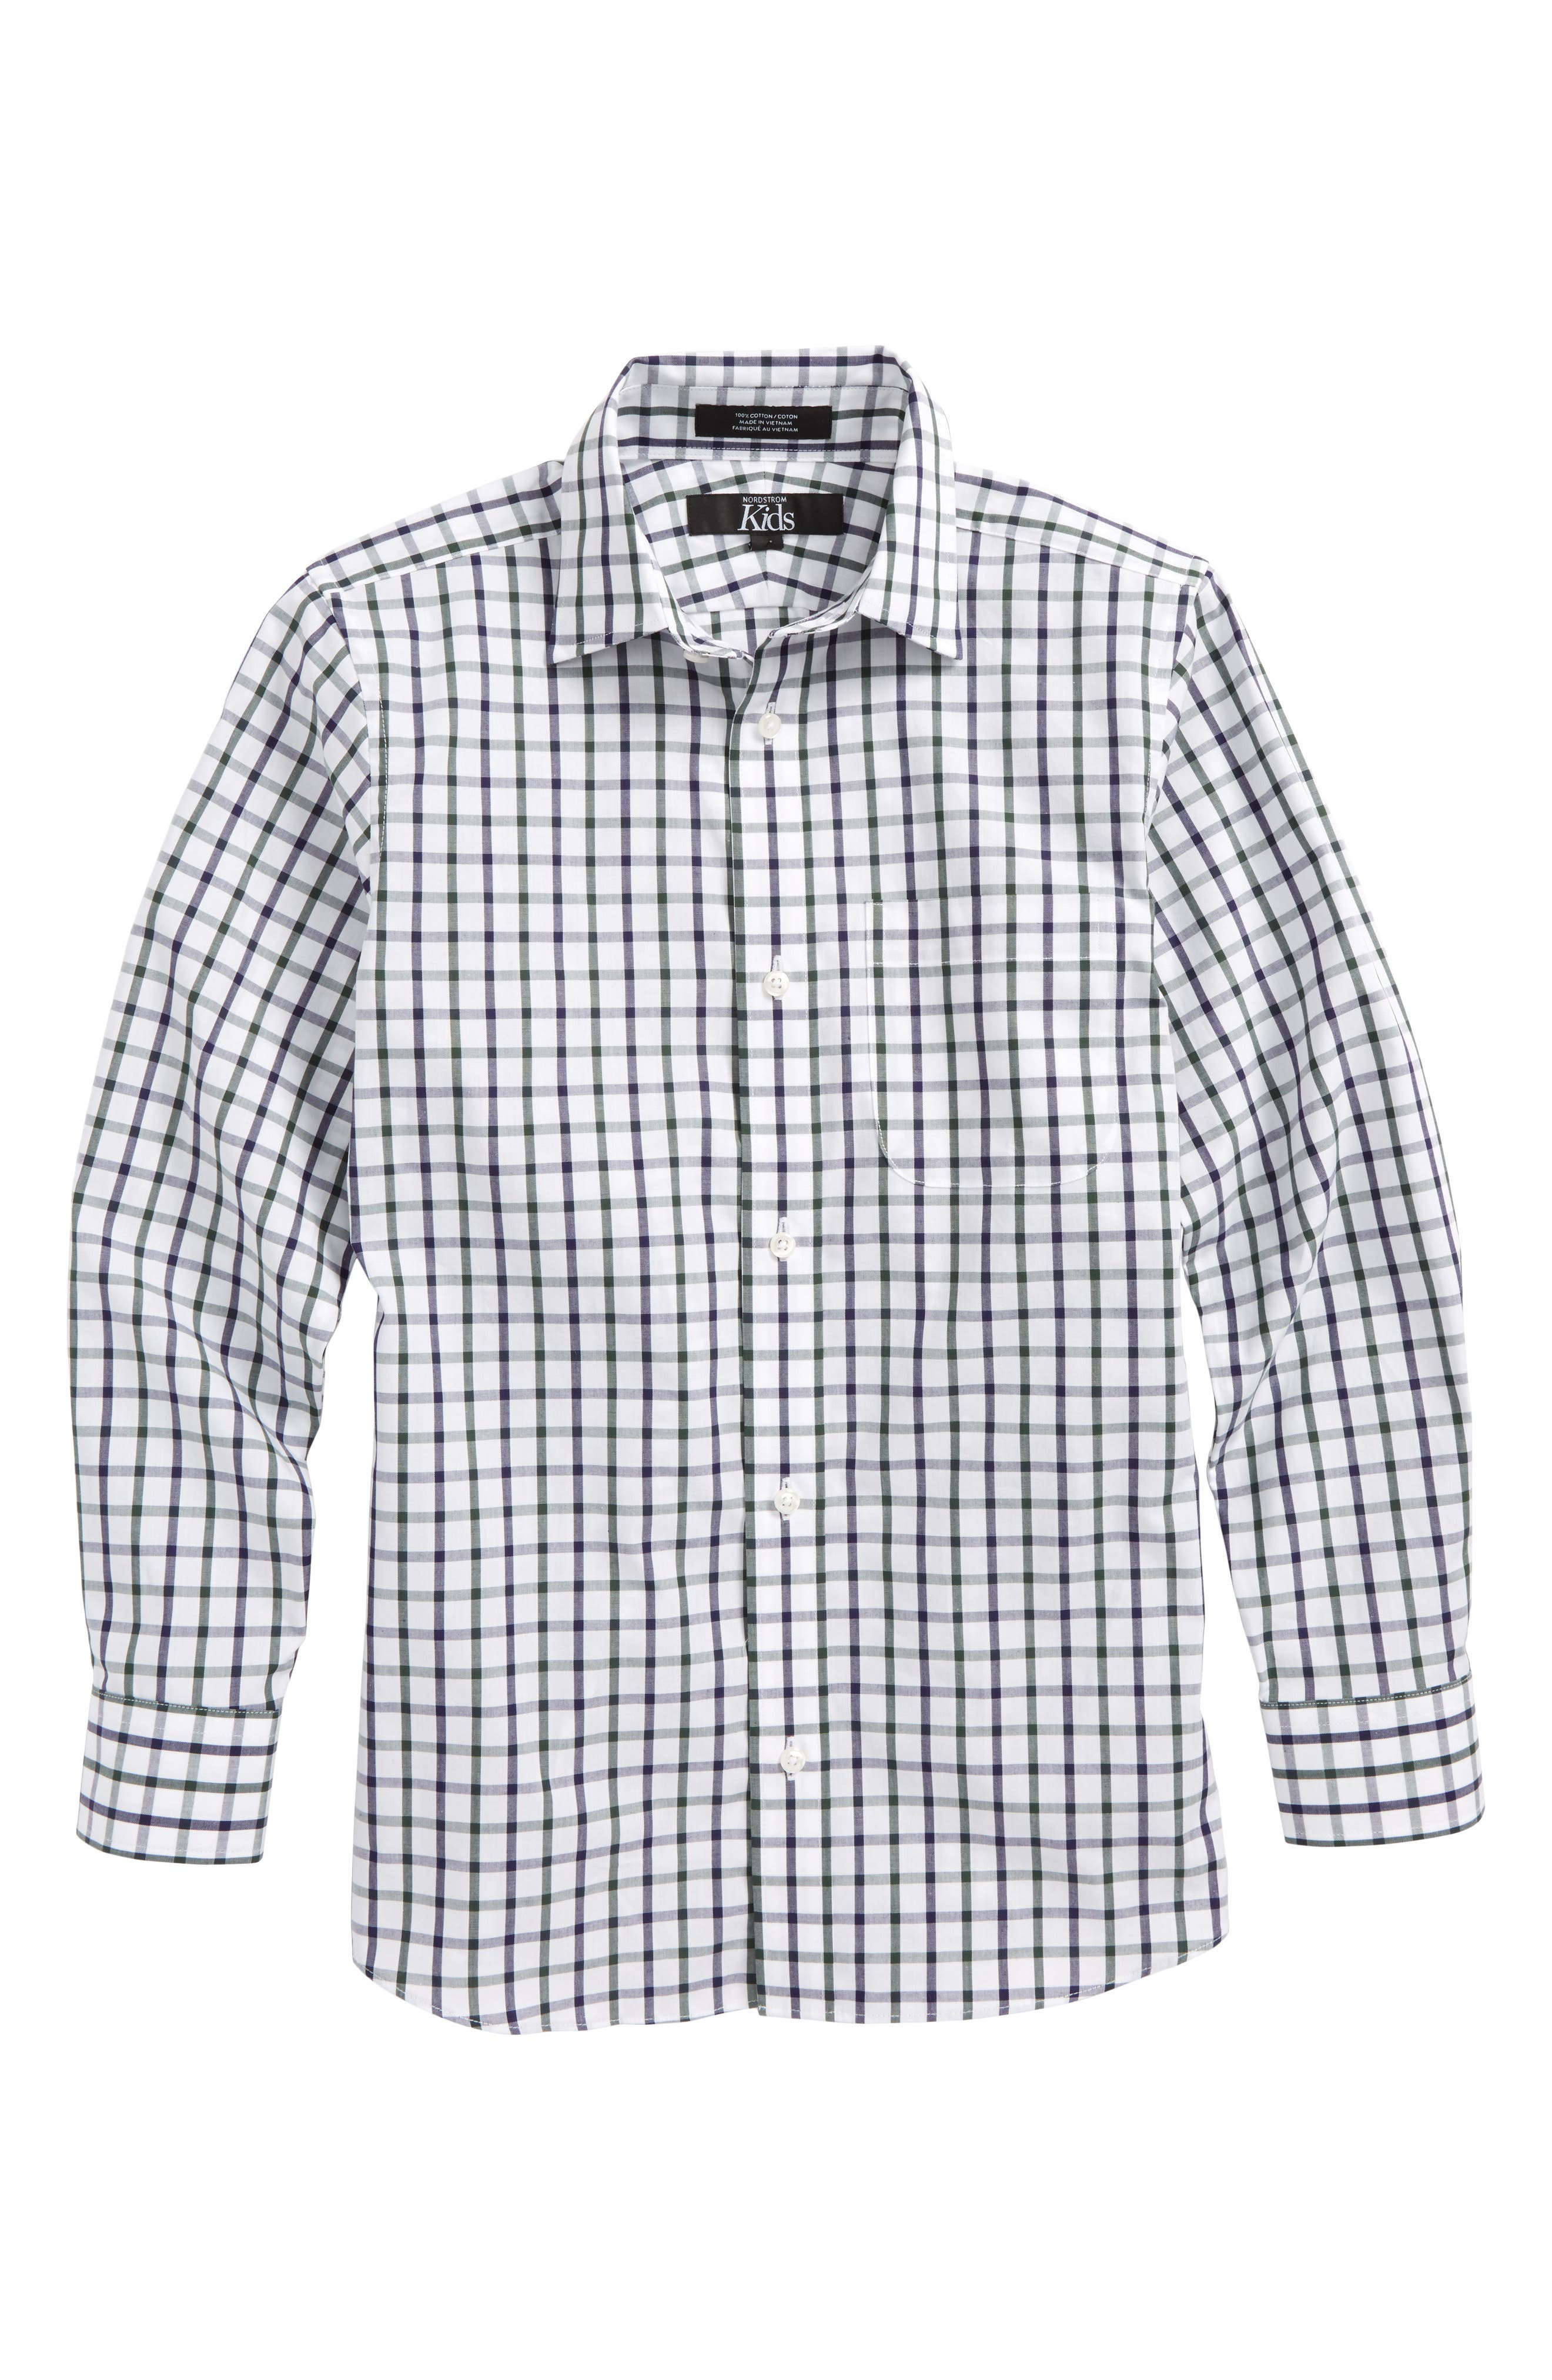 Windowpane Plaid Dress Shirt,                             Main thumbnail 1, color,                             White-Navy Plaid